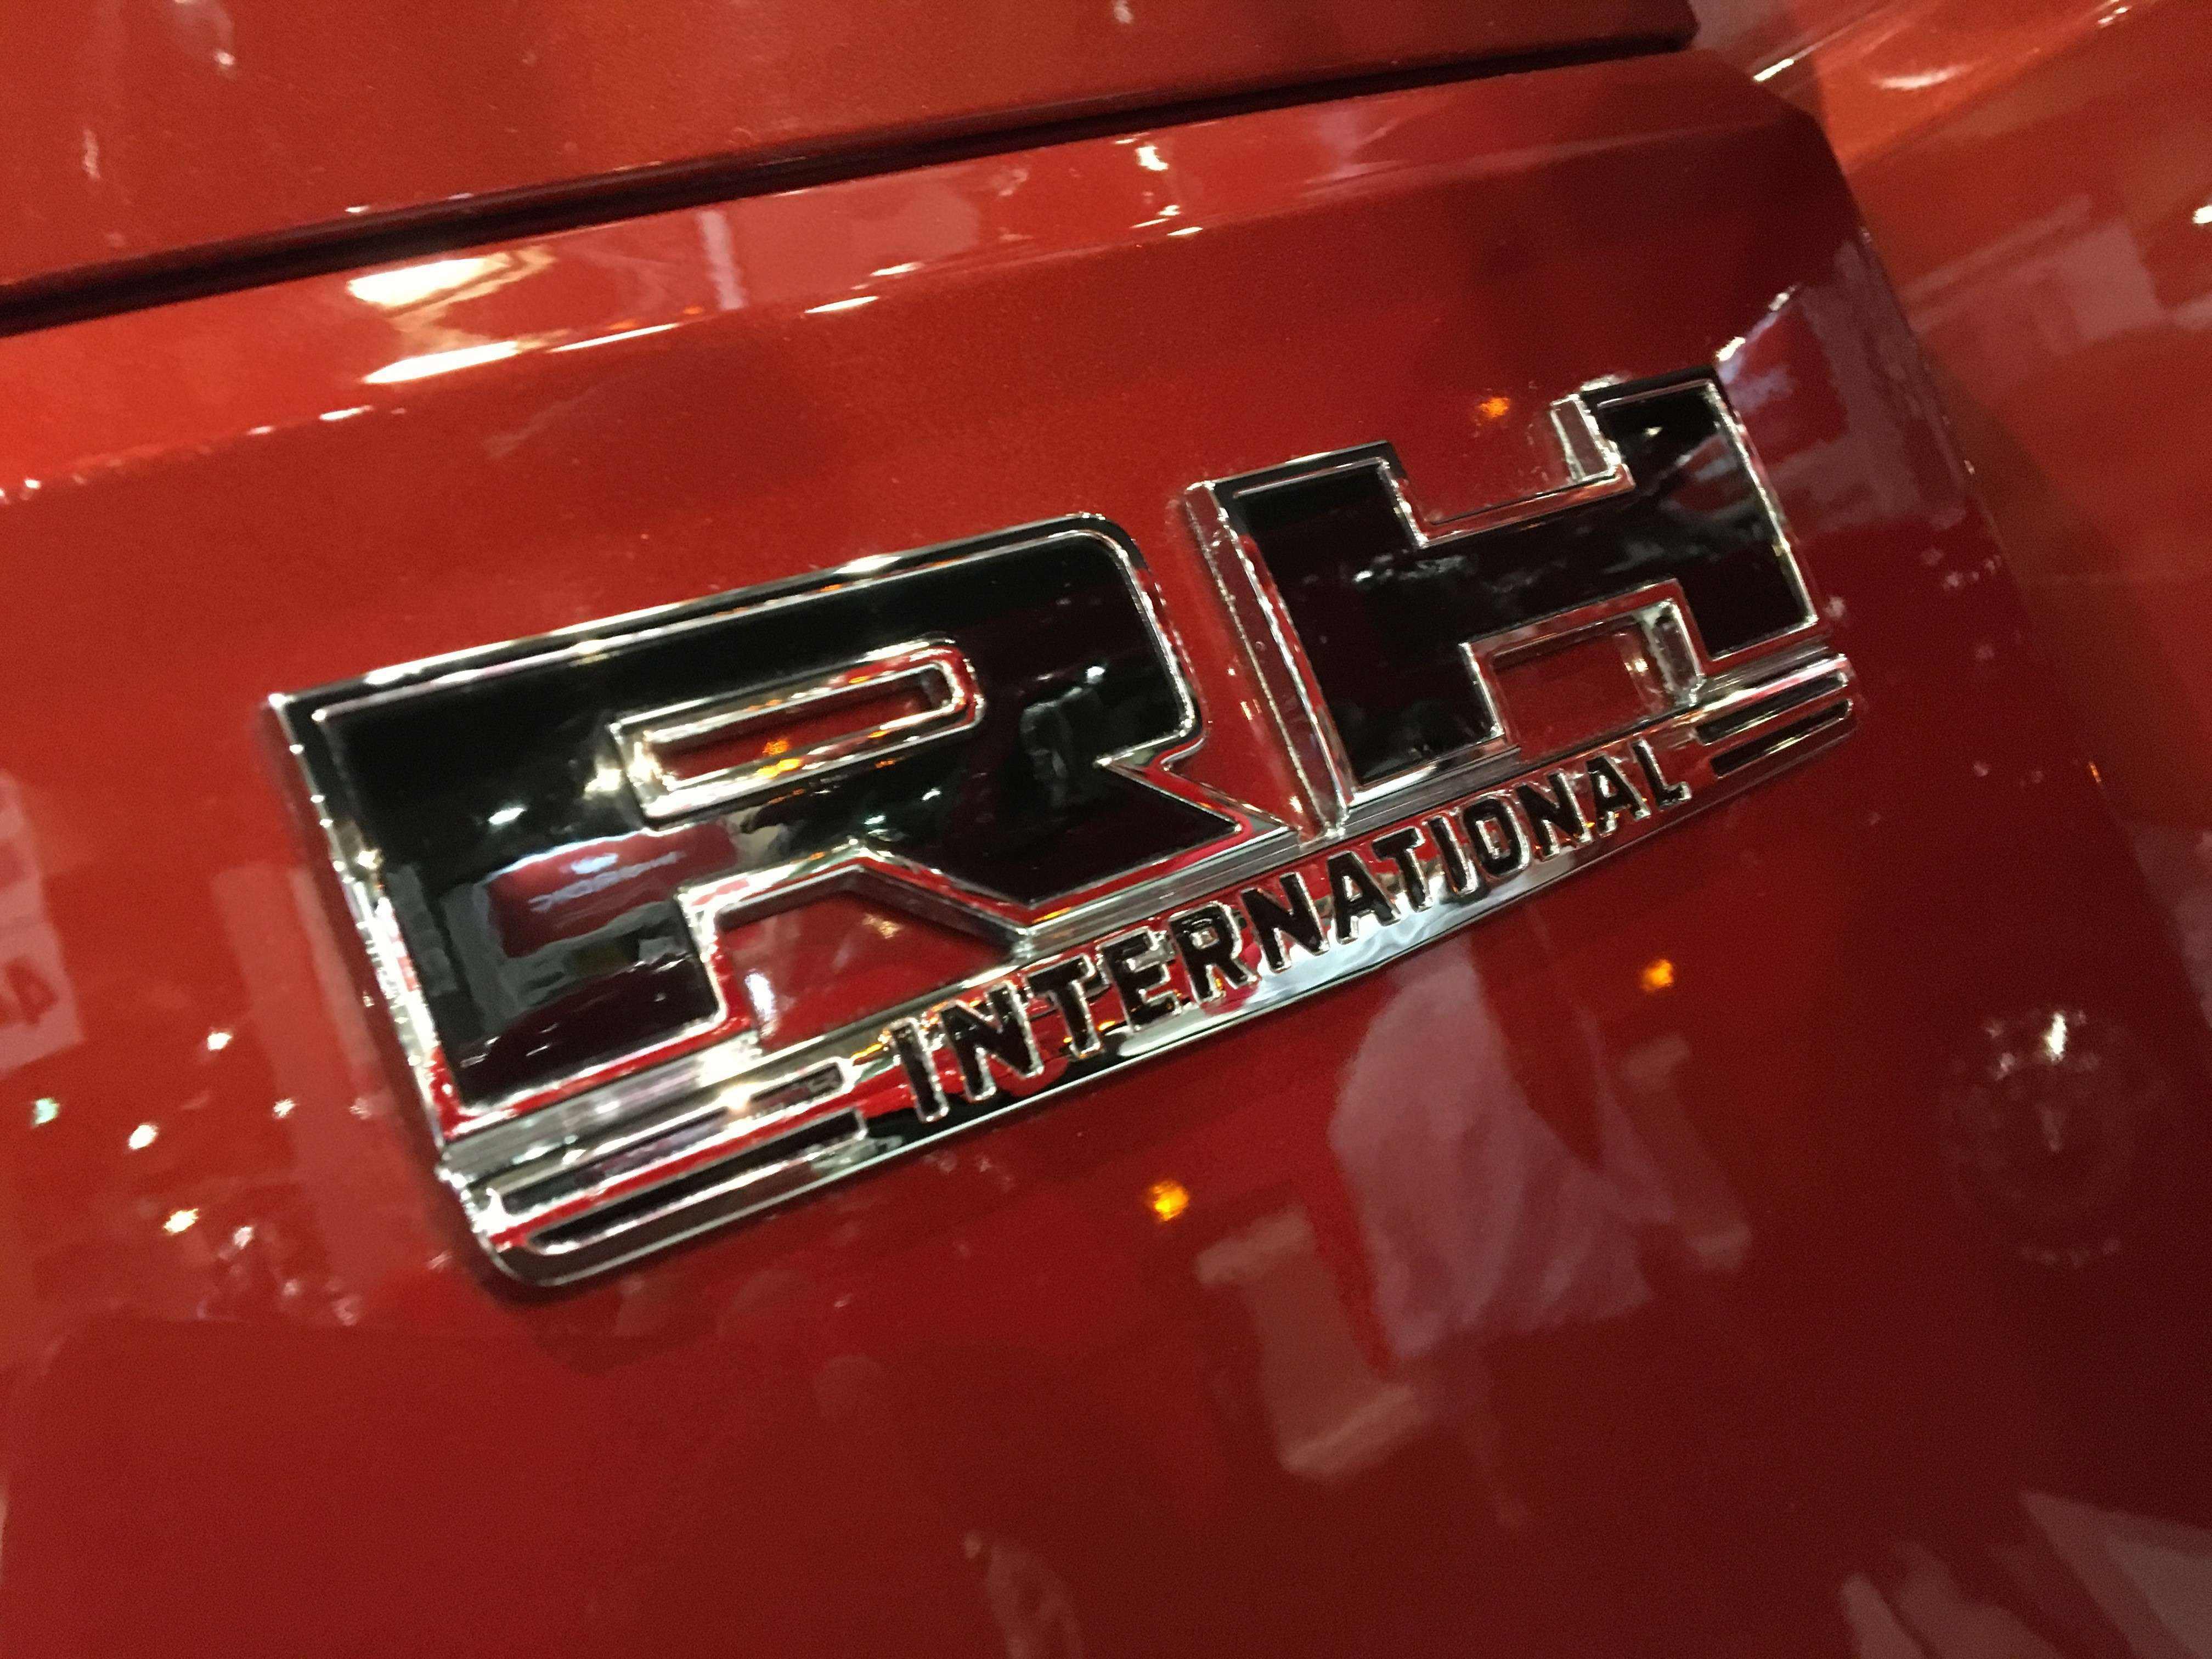 RH International truck emblem